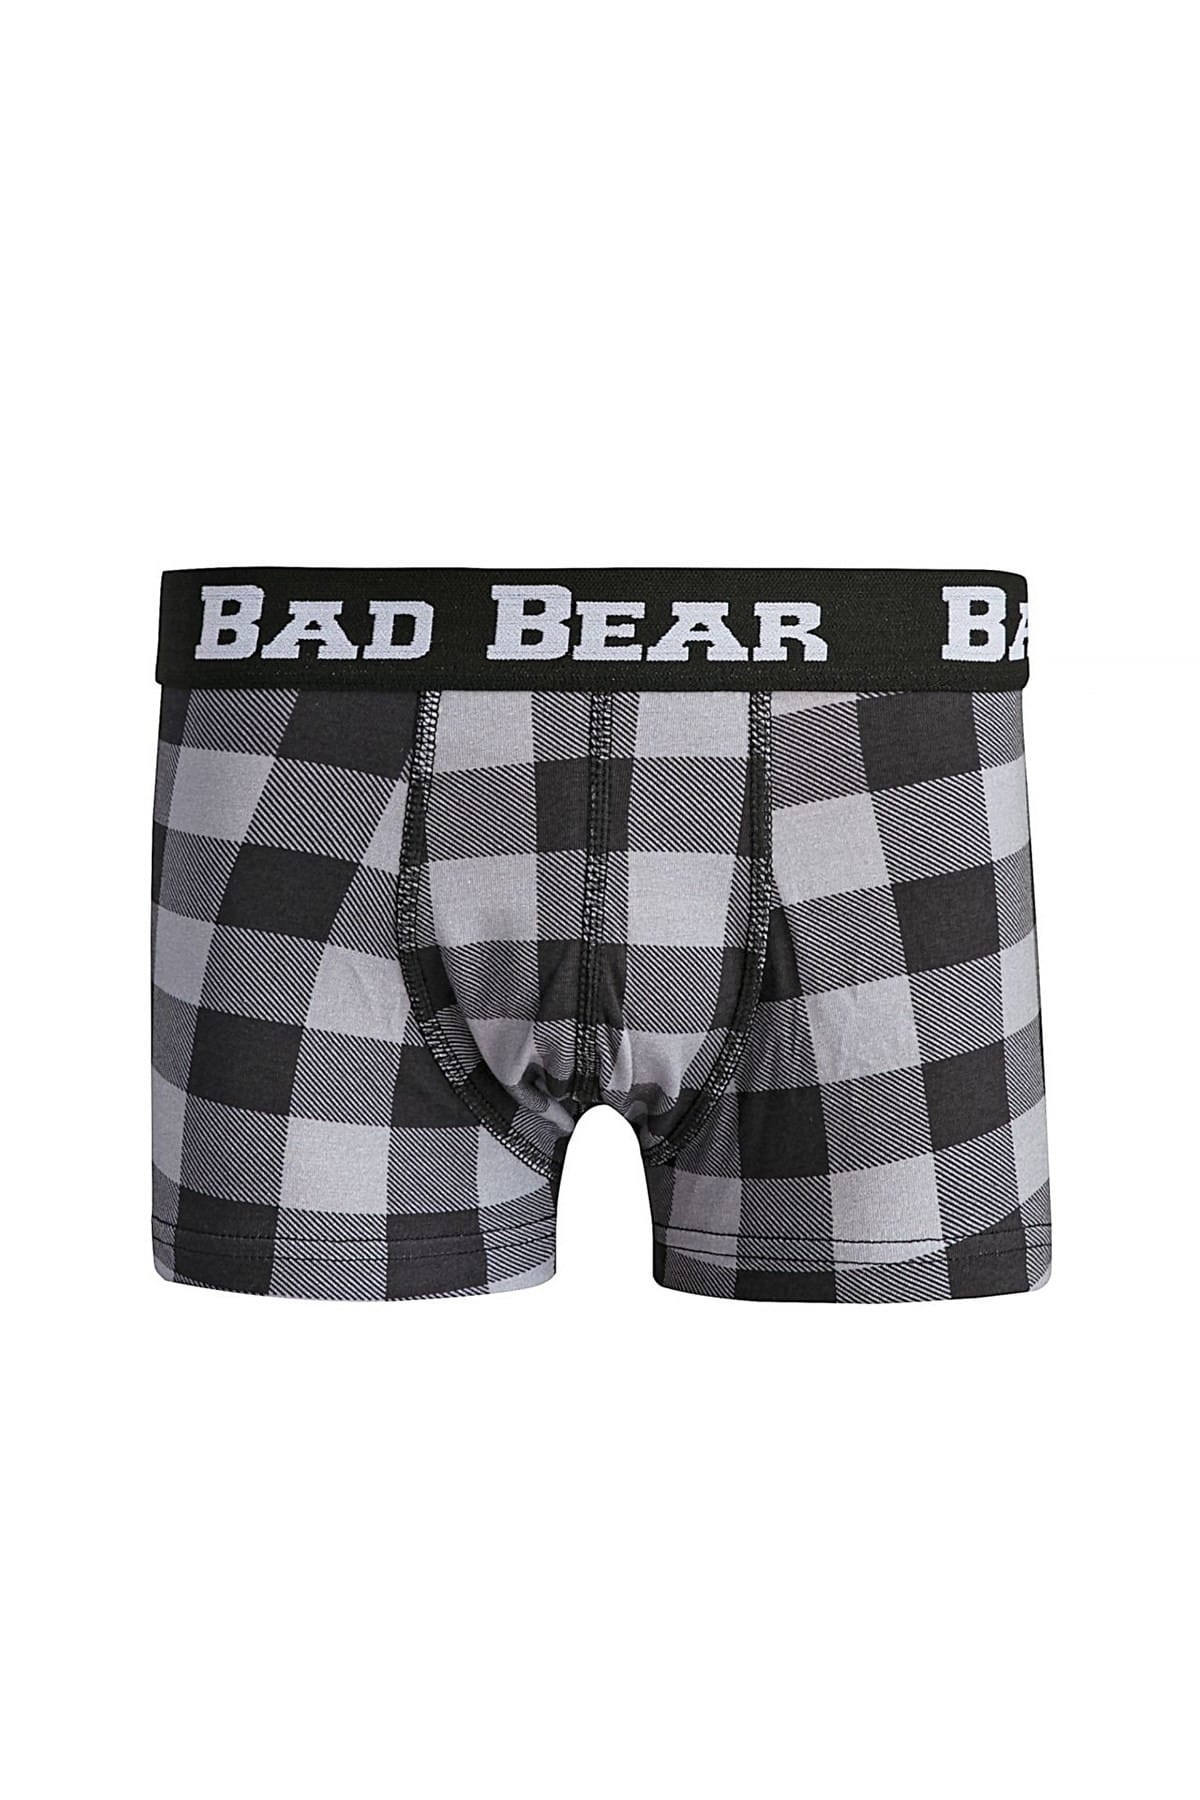 Bad Bear CHECKED RAVEN 1